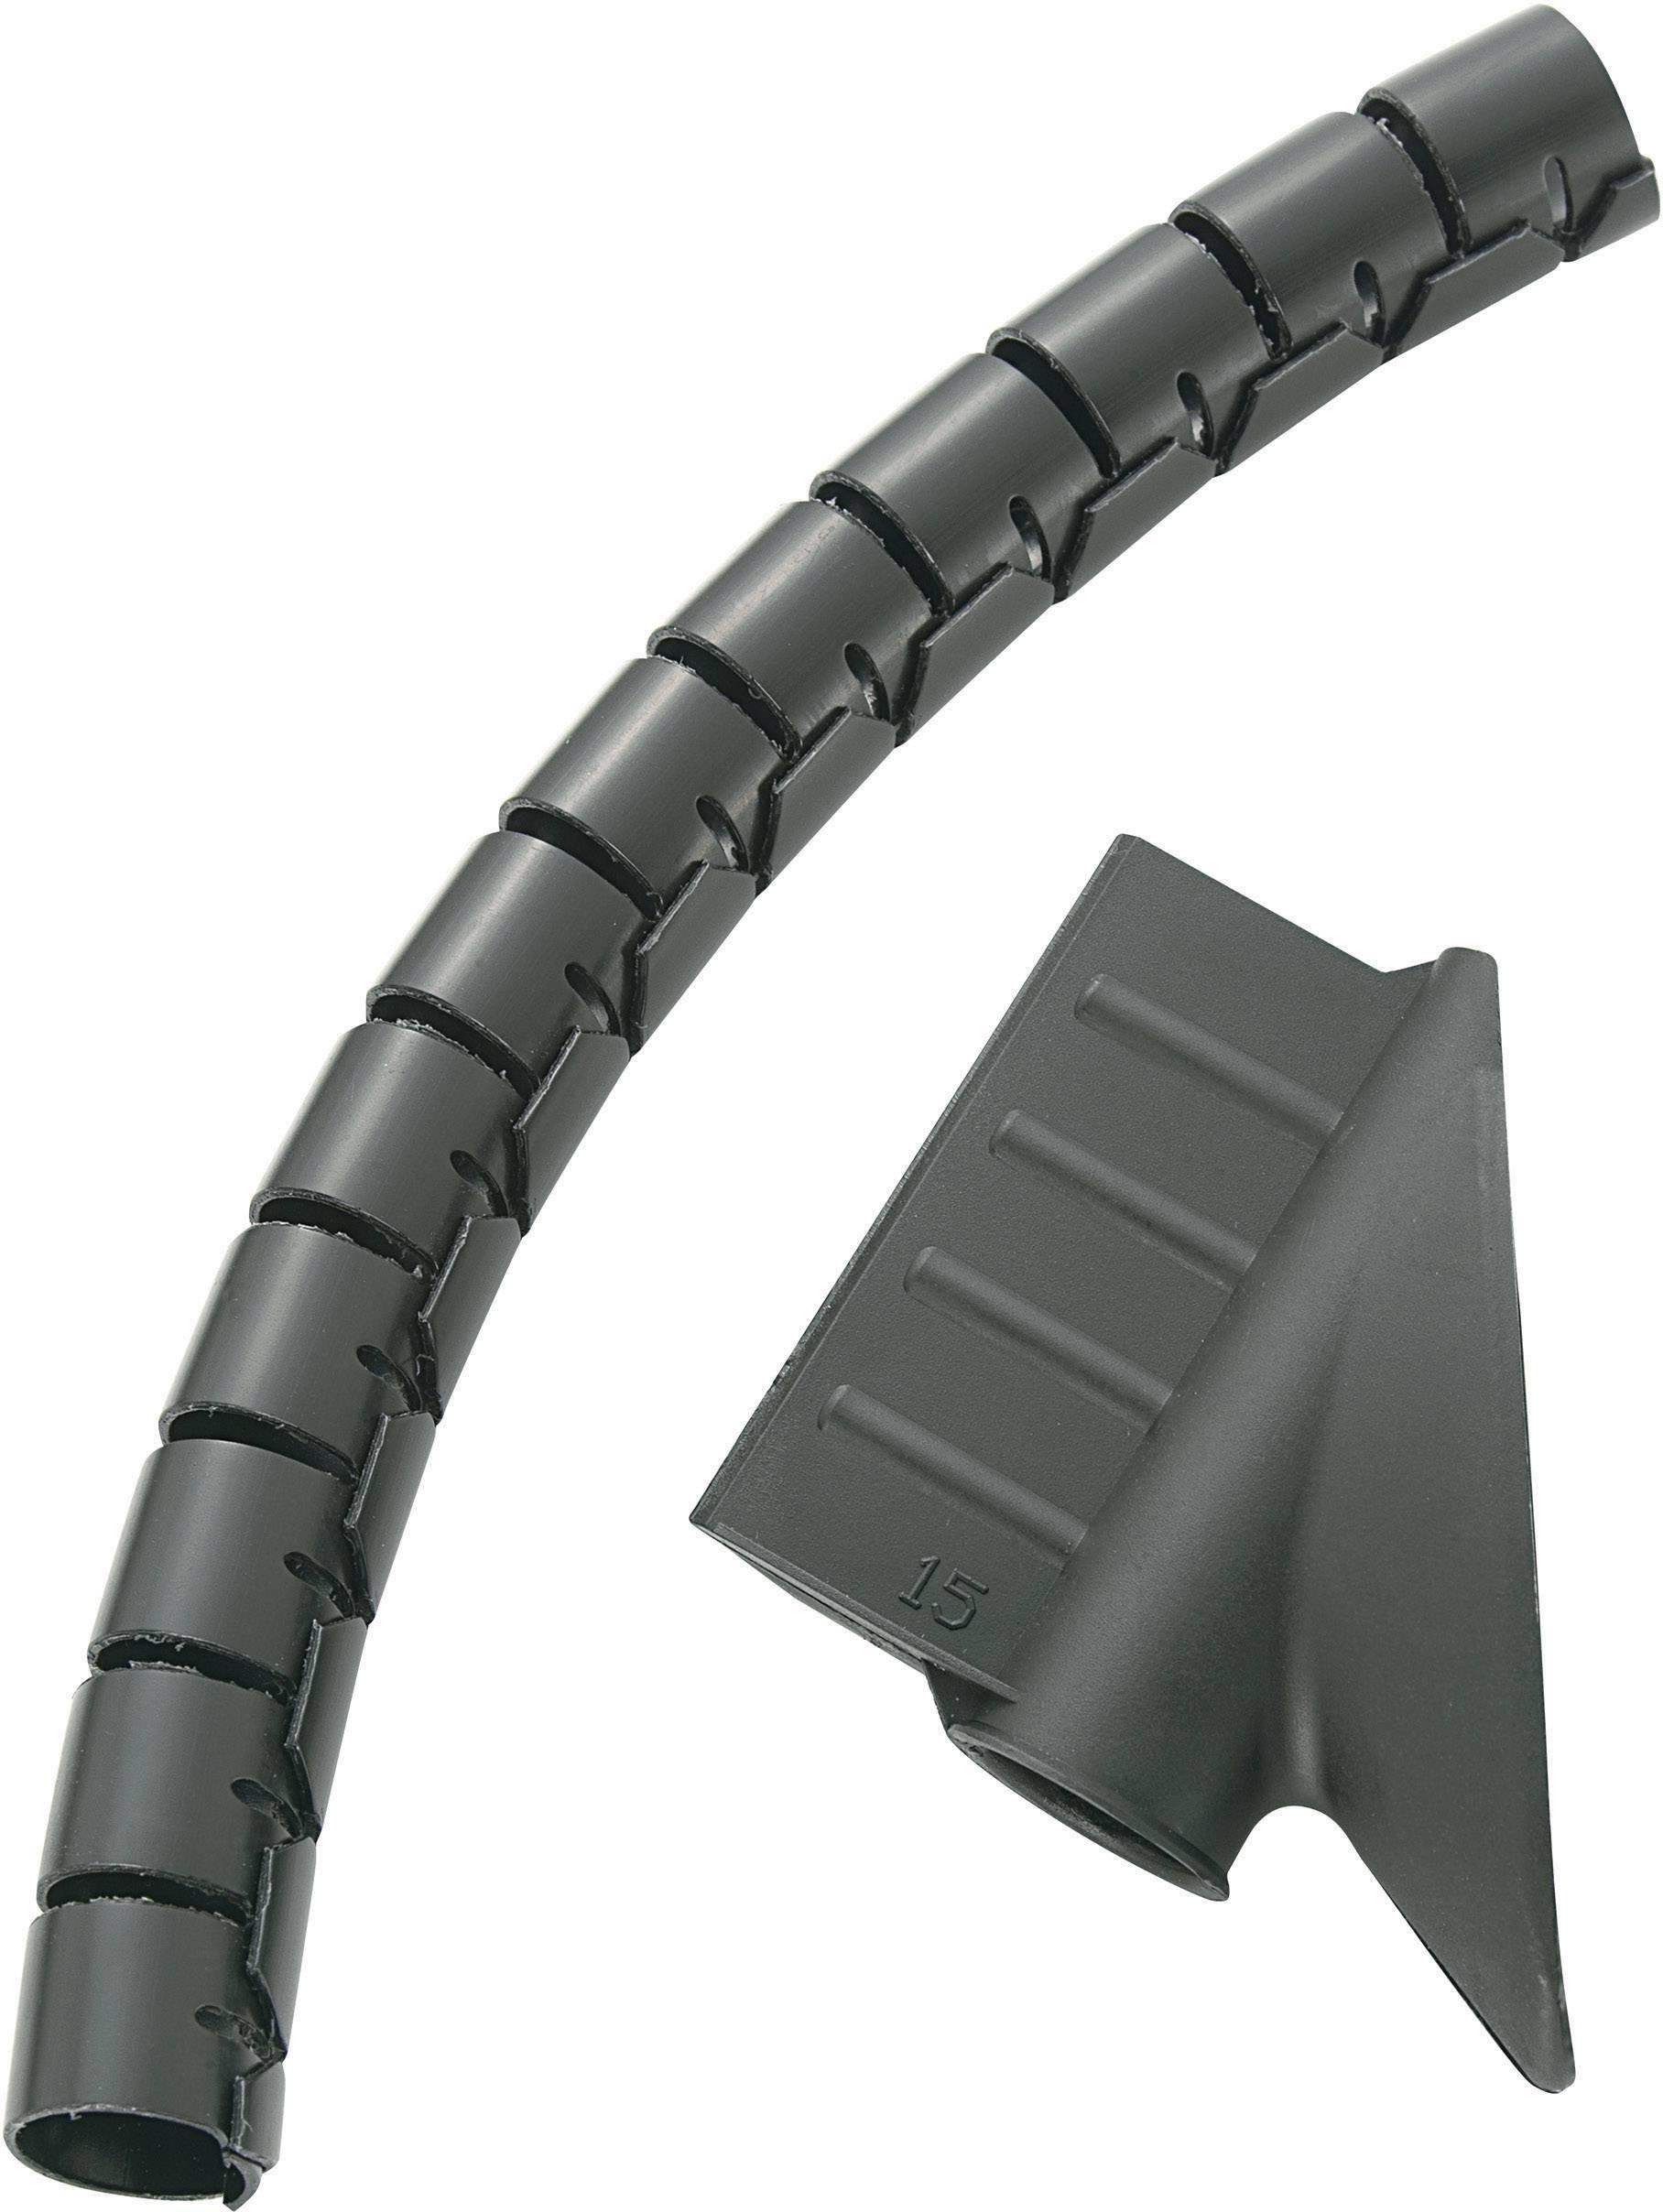 Káblový oplet KSS MX-KLT32SL 28530c1035, strieborná, 5 m